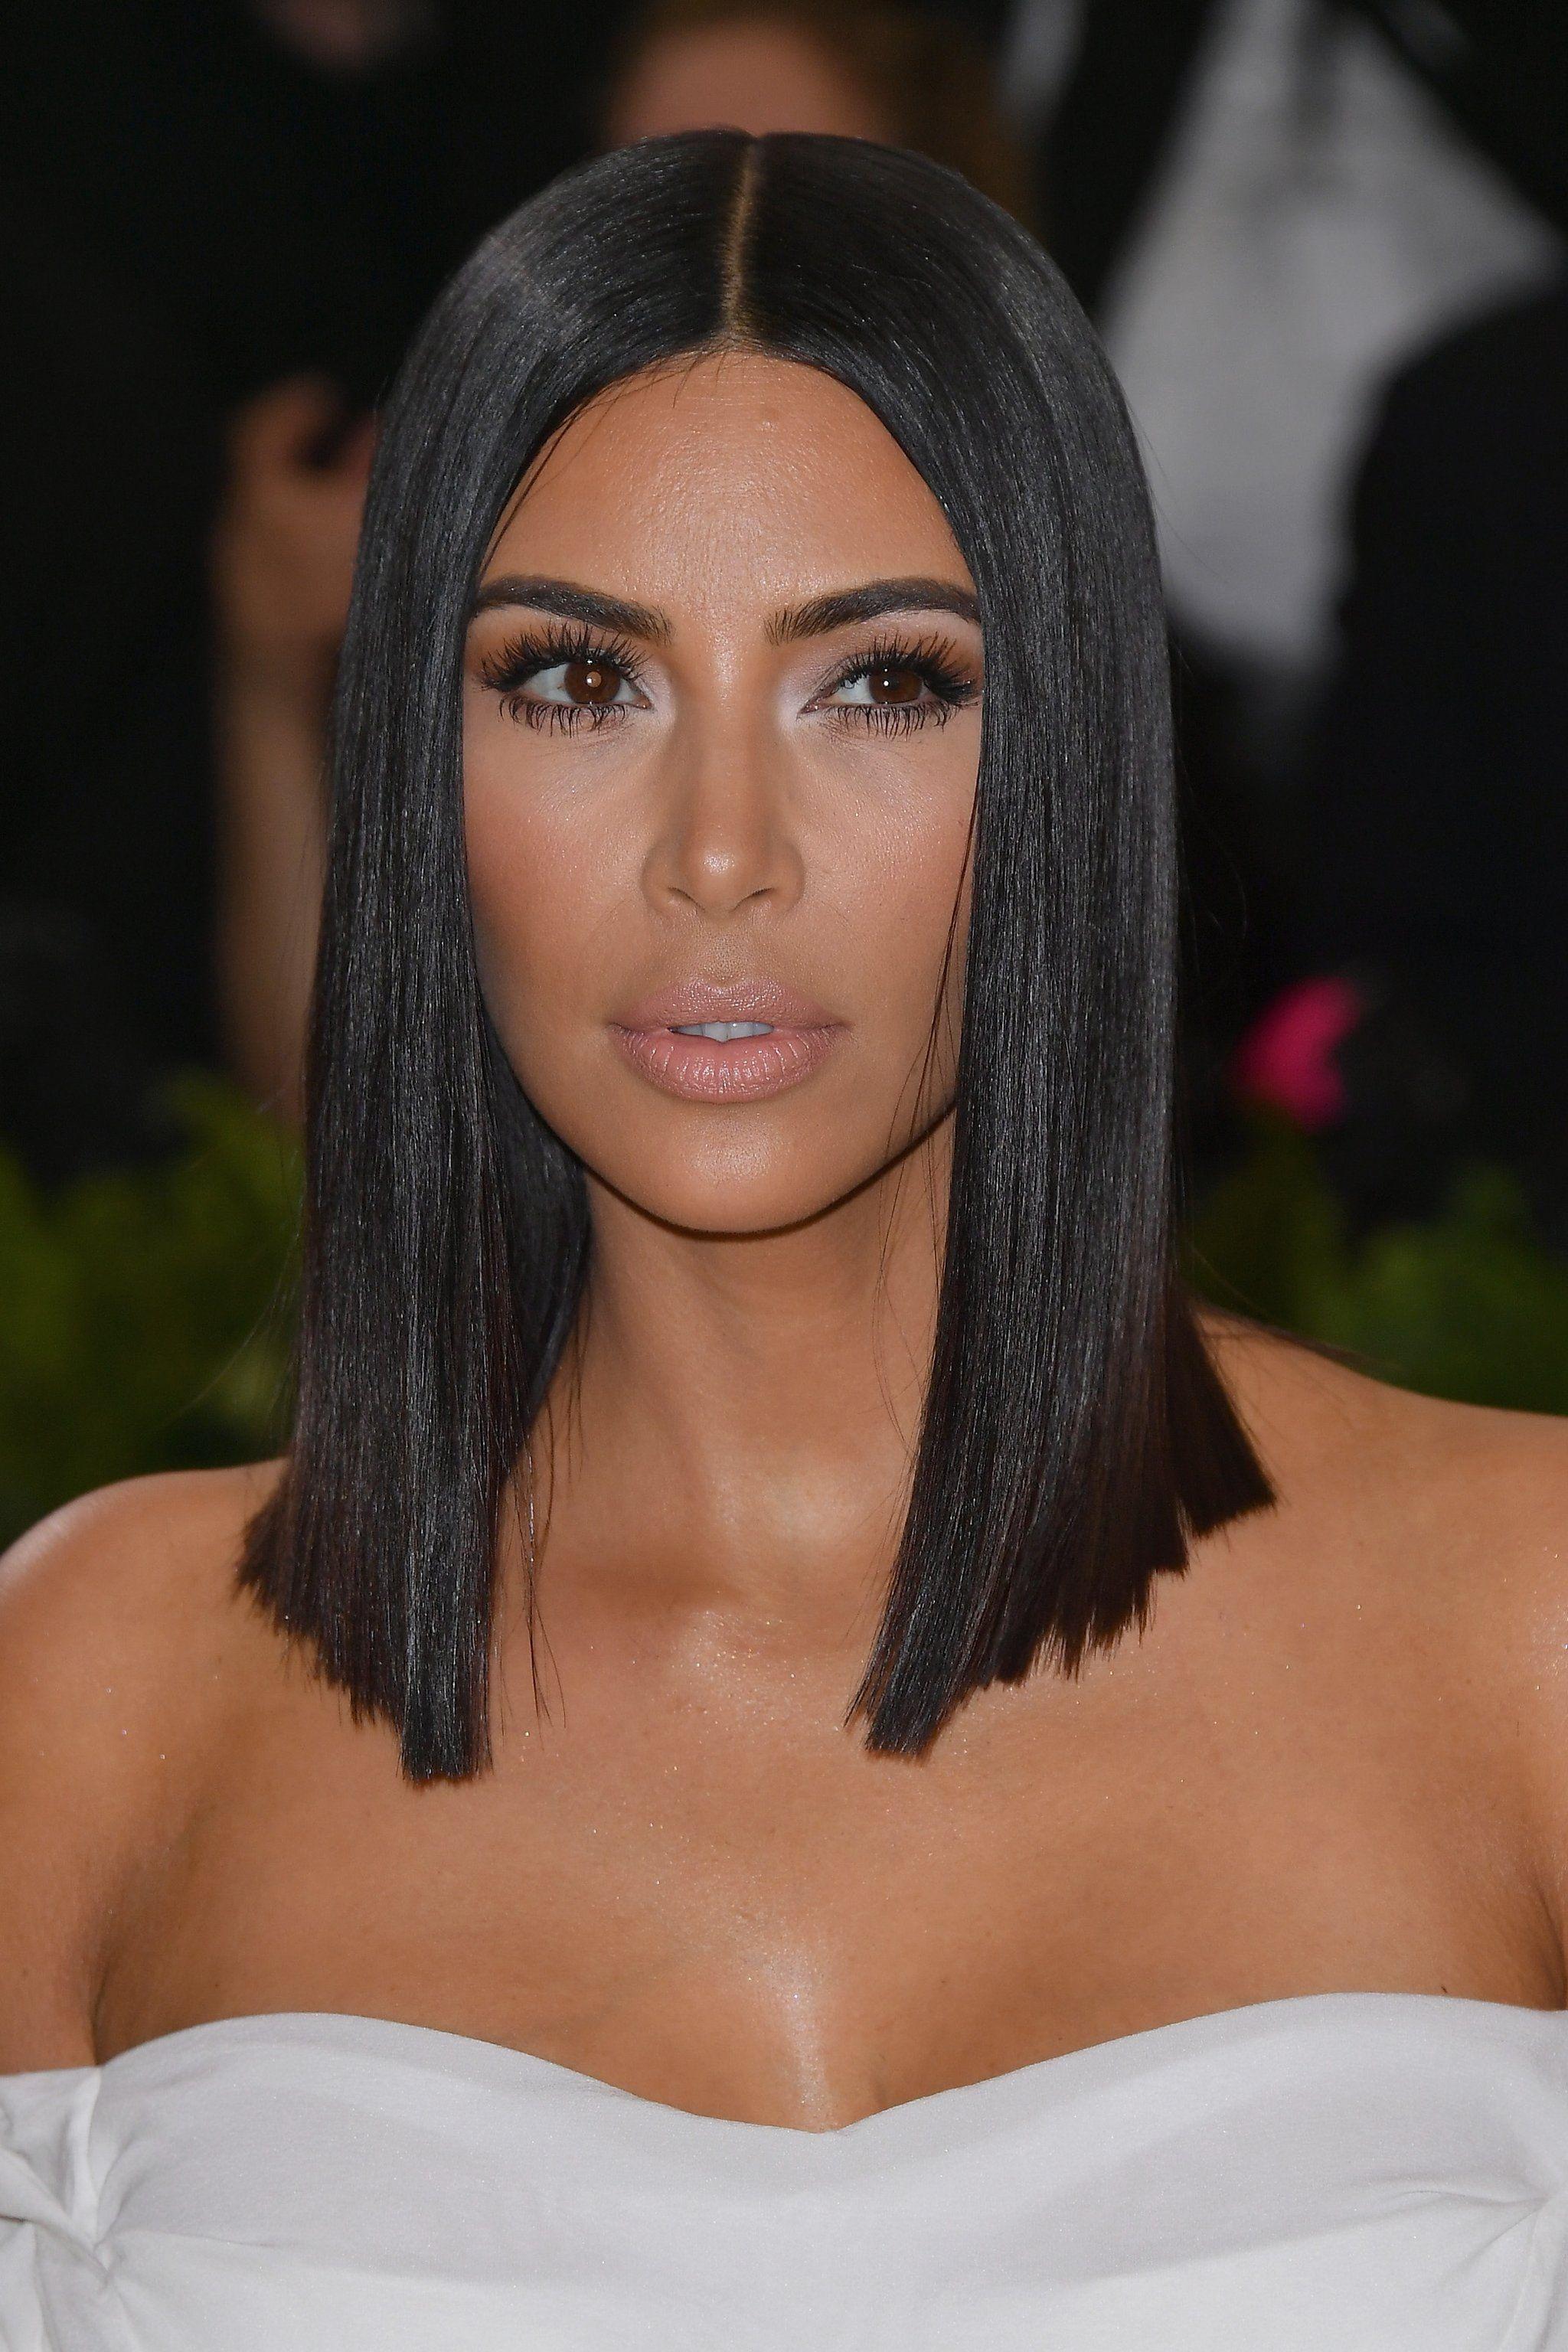 Kim Kardashian Looked Classic Vogue Chic At The Met Gala Kardashian Hair Kim Kardashian Short Hair Kim Kardashian Hair